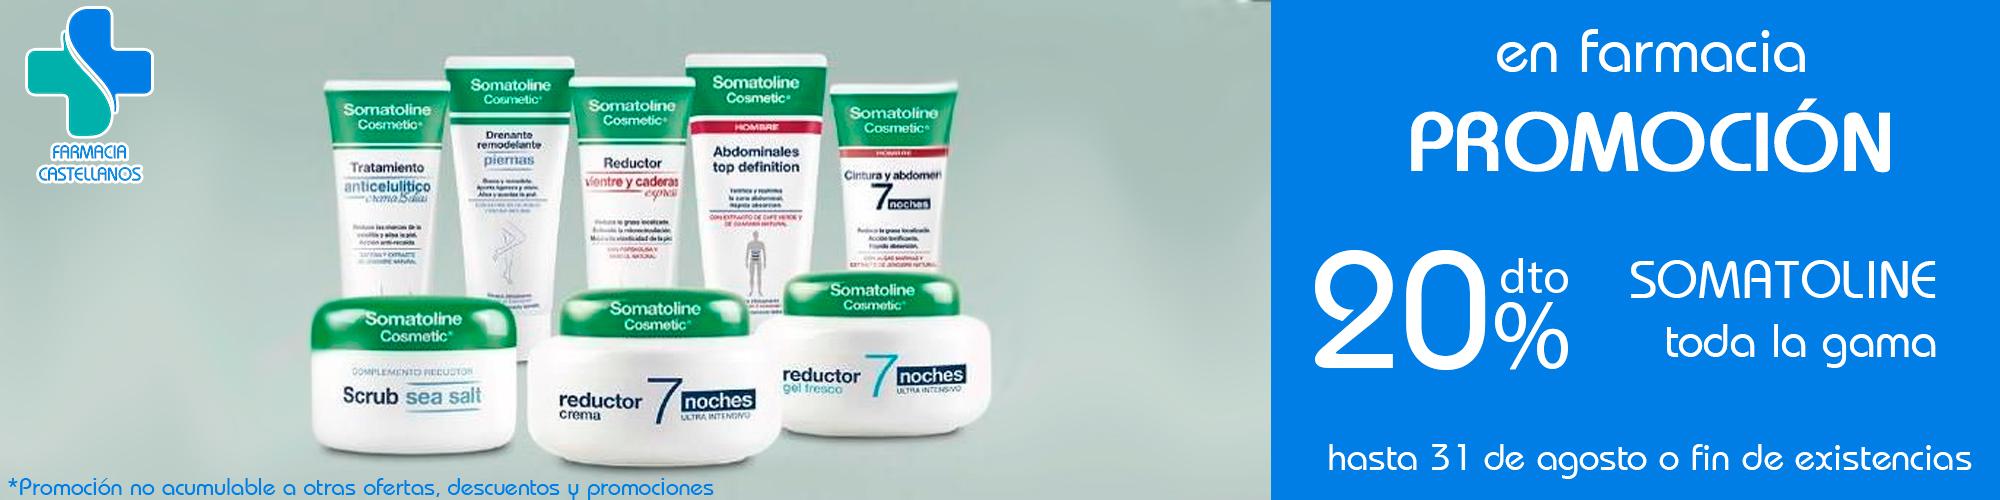 promocion-somatoline-ago-farmaciabeatrizcastellanos